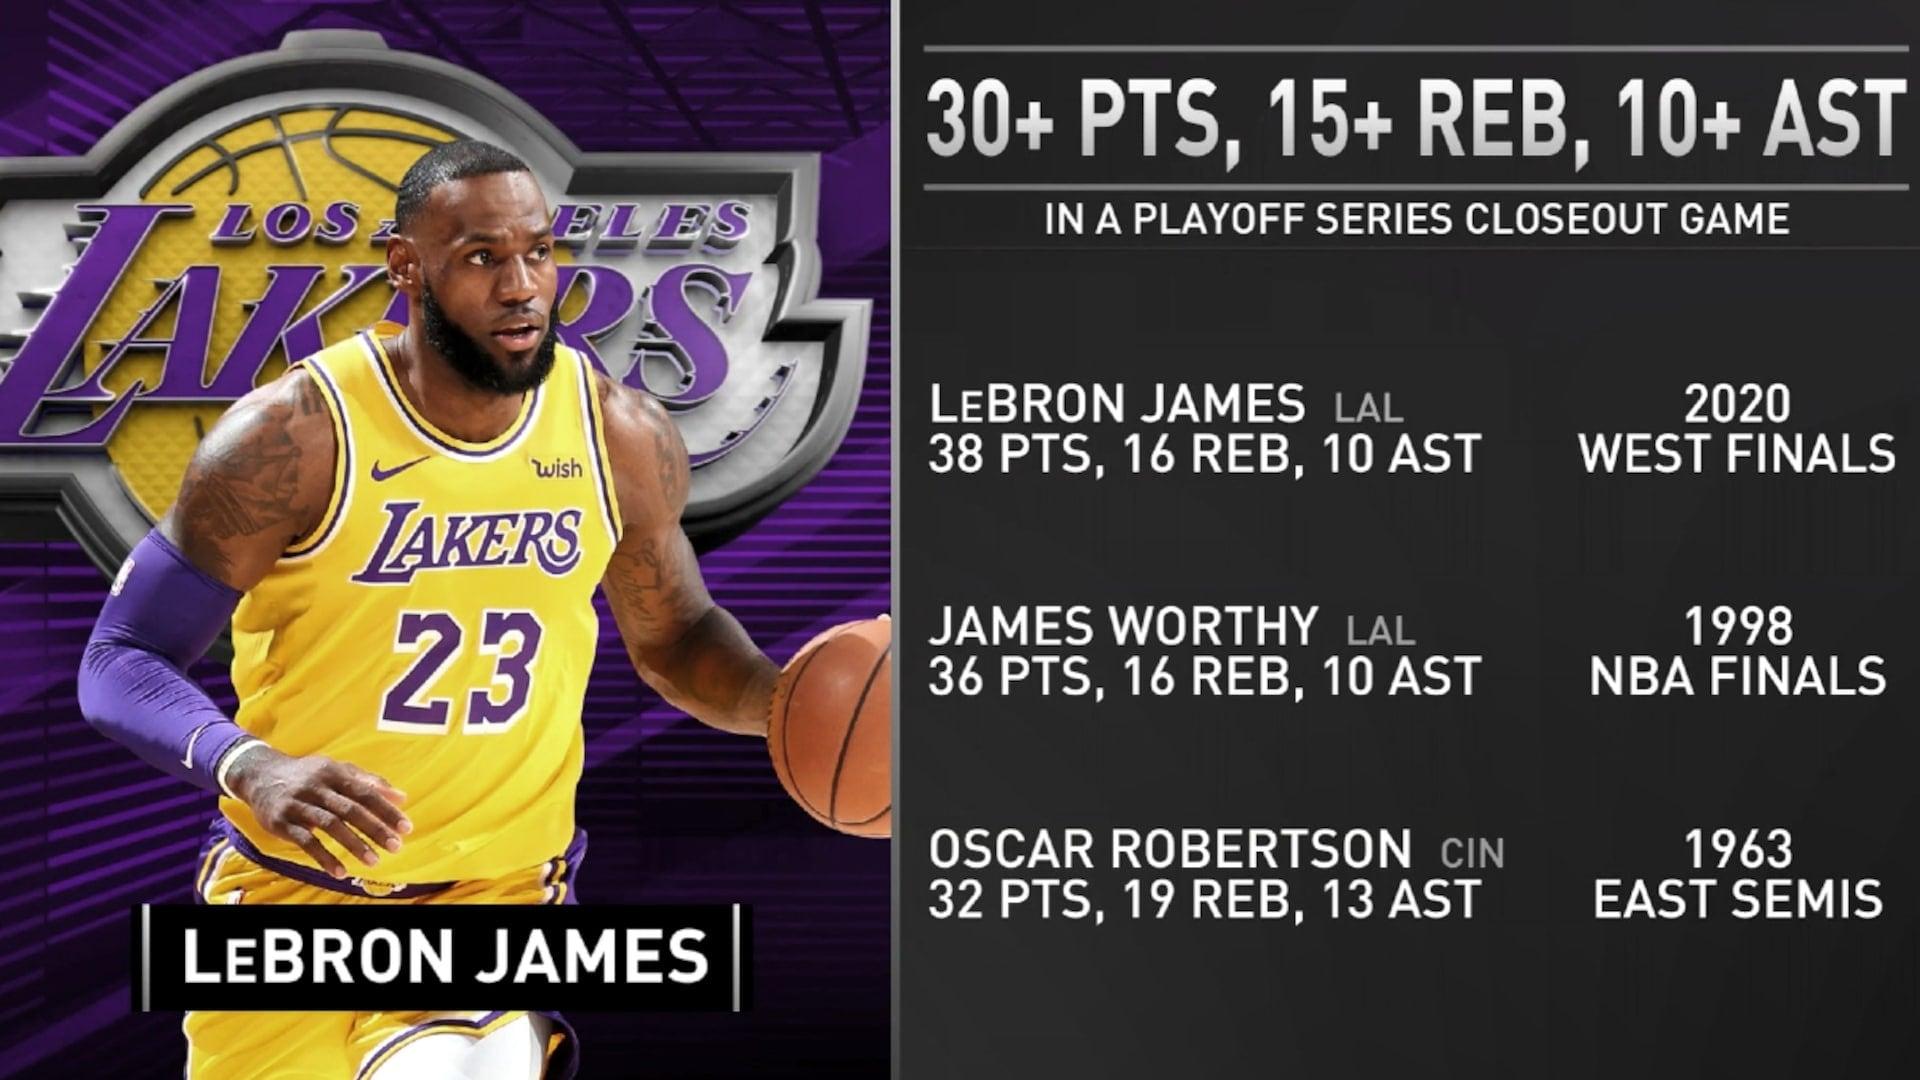 LeBron James leads Lakers back to NBA